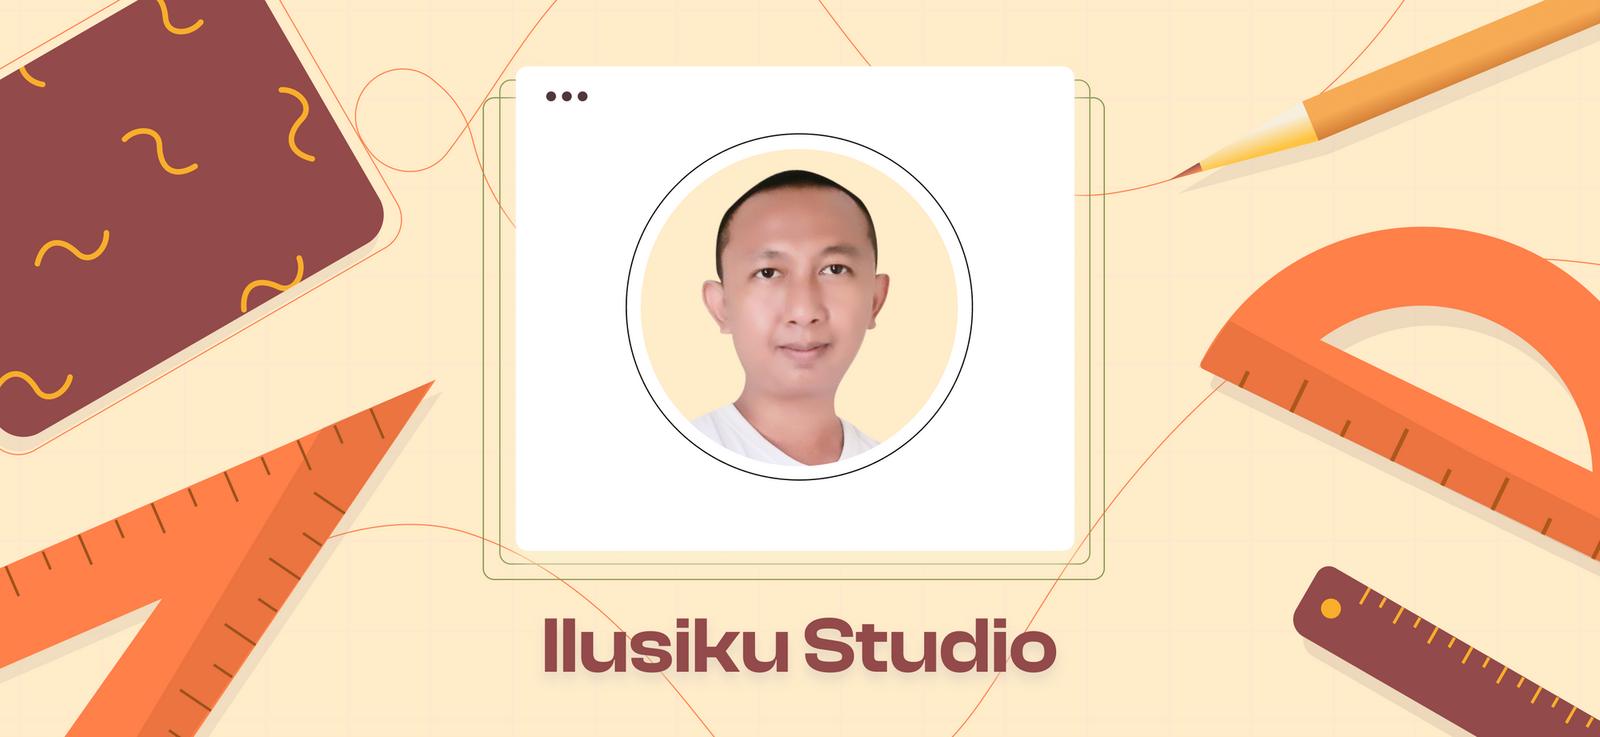 Designer Interview | Ilusiku Studio